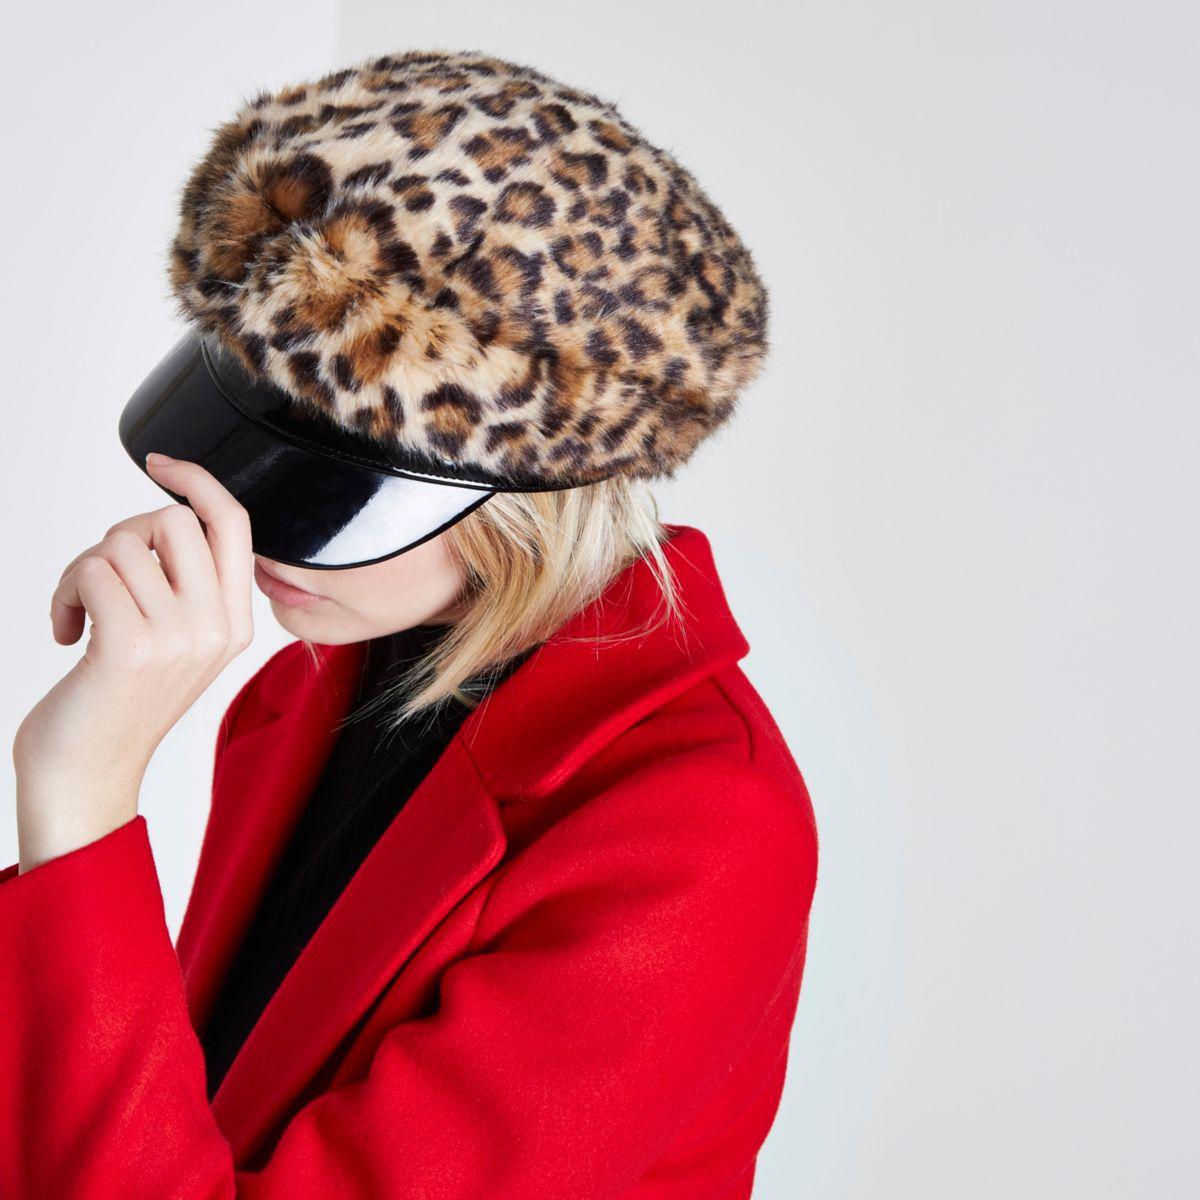 Lyst - River Island Brown Leopard Print Faux Fur Baker Boy Hat Brown ... 4d34215e844